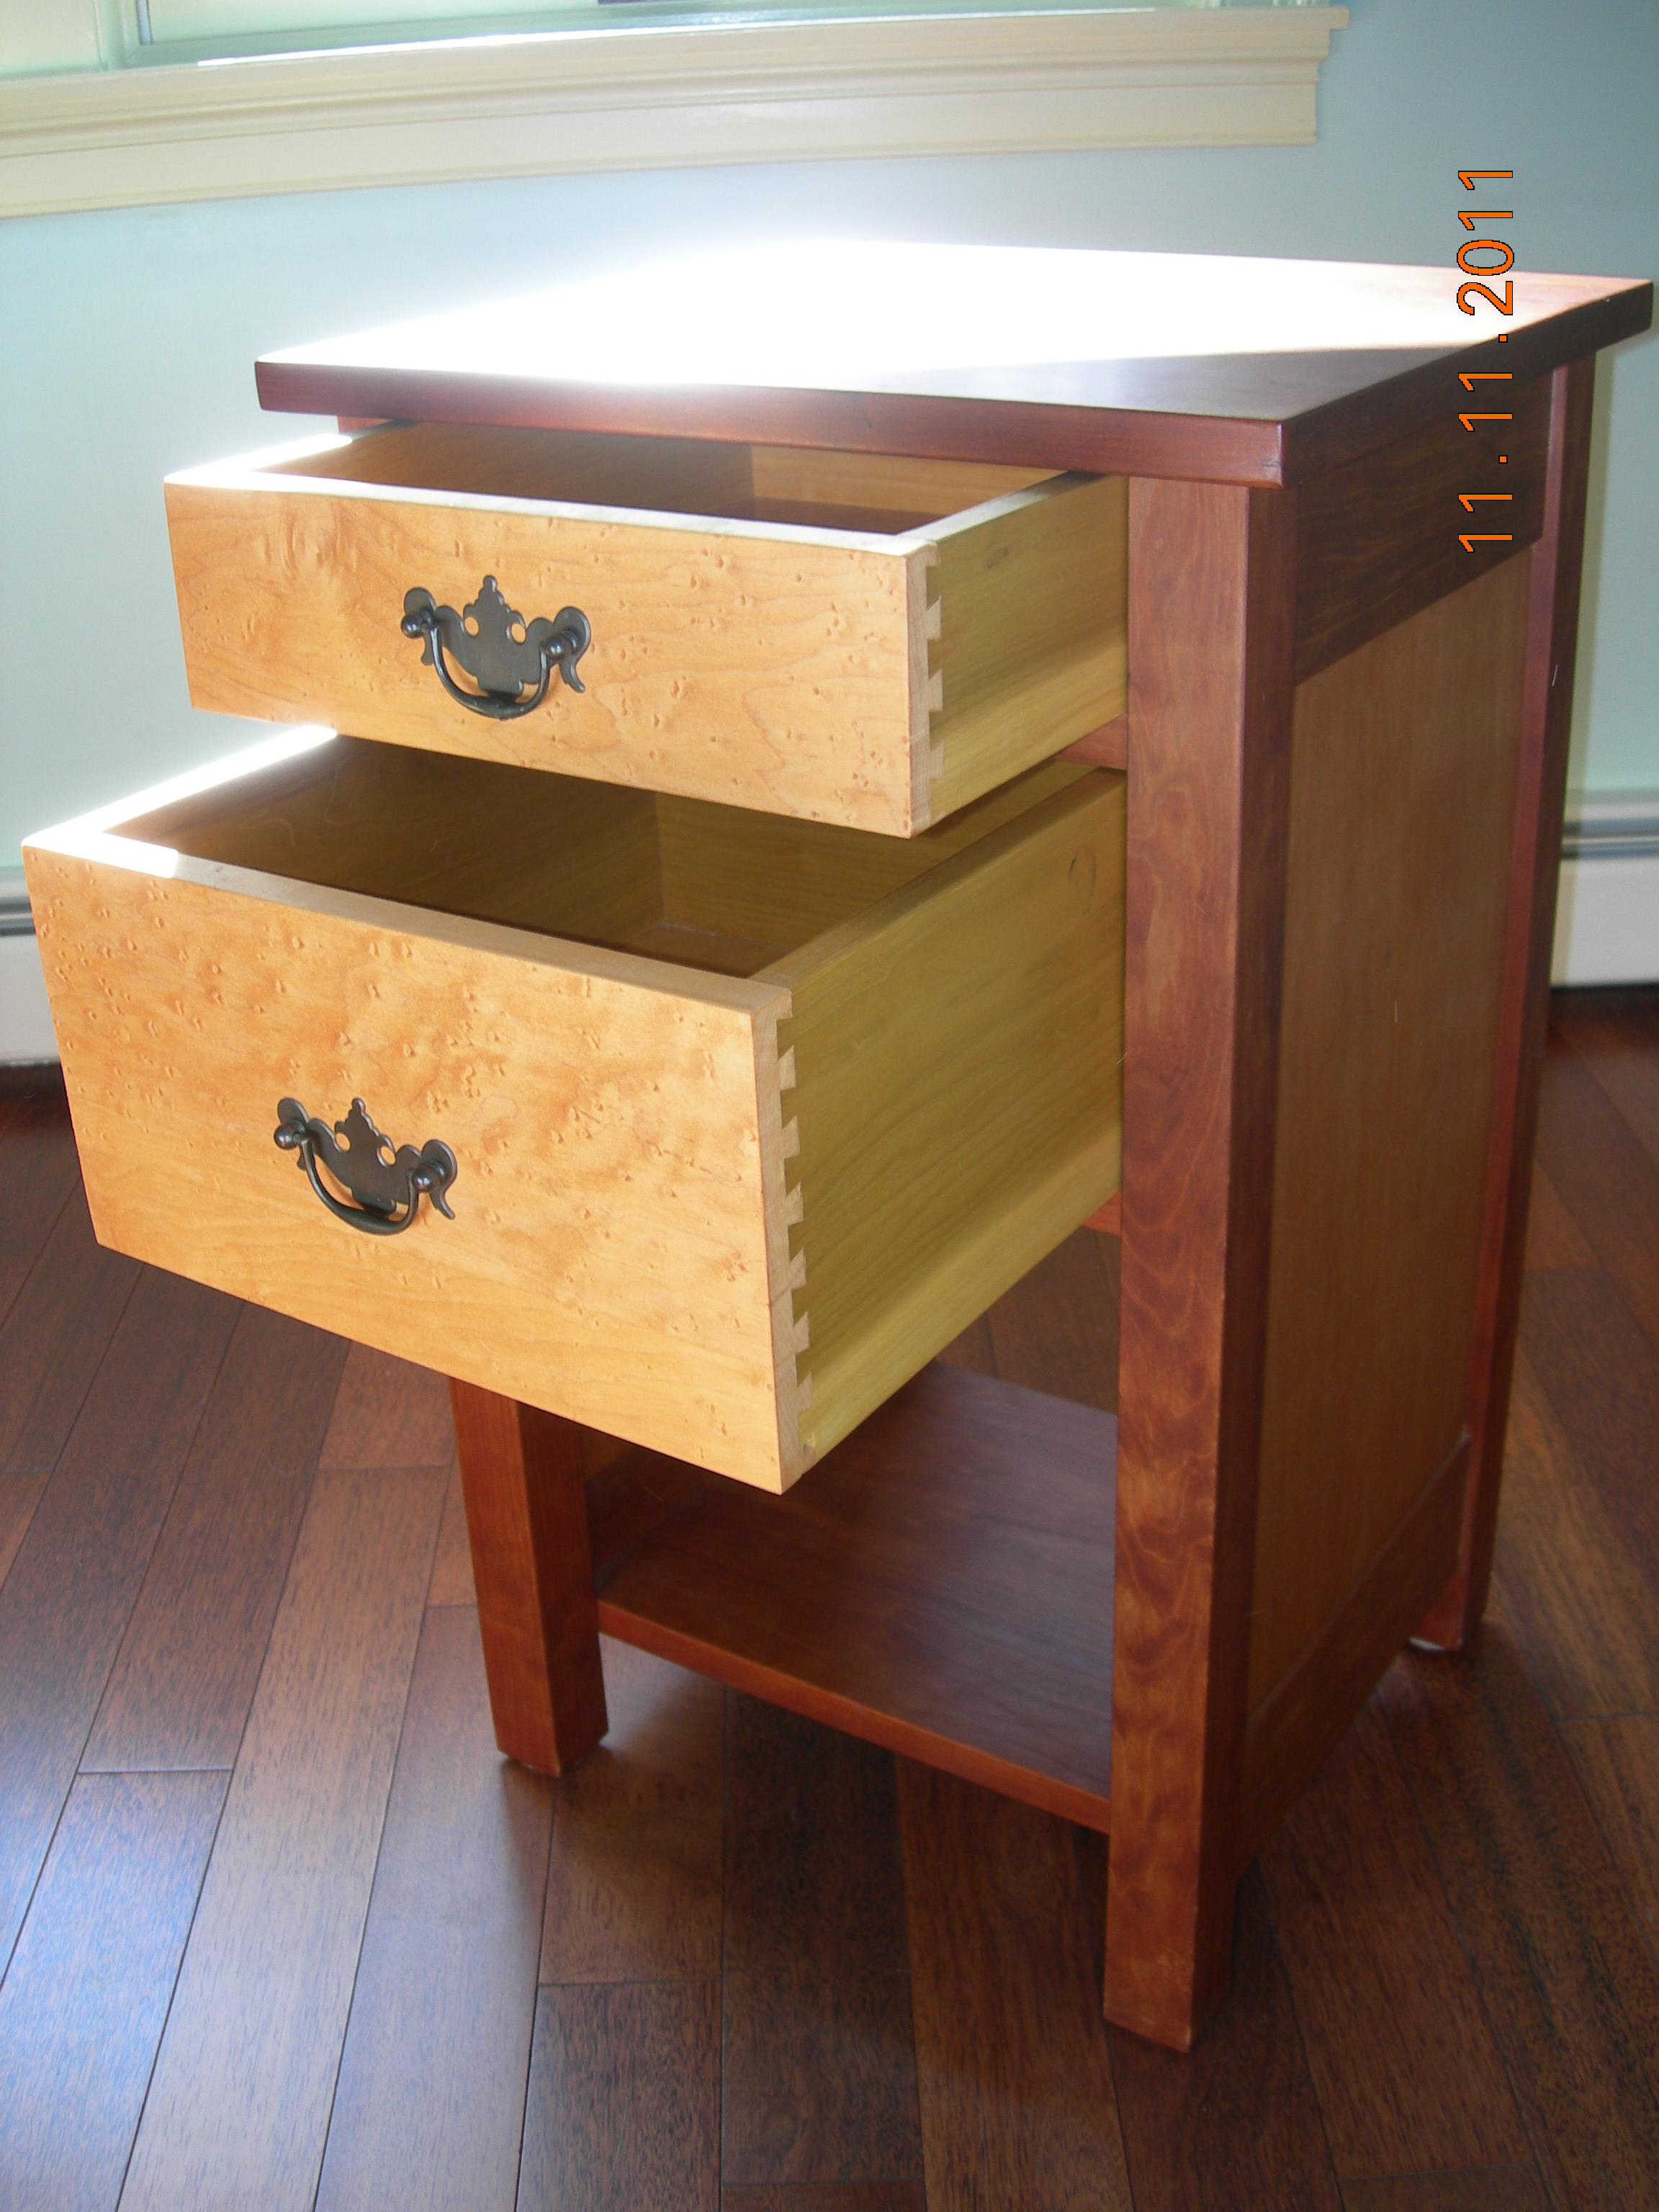 Deep drawers